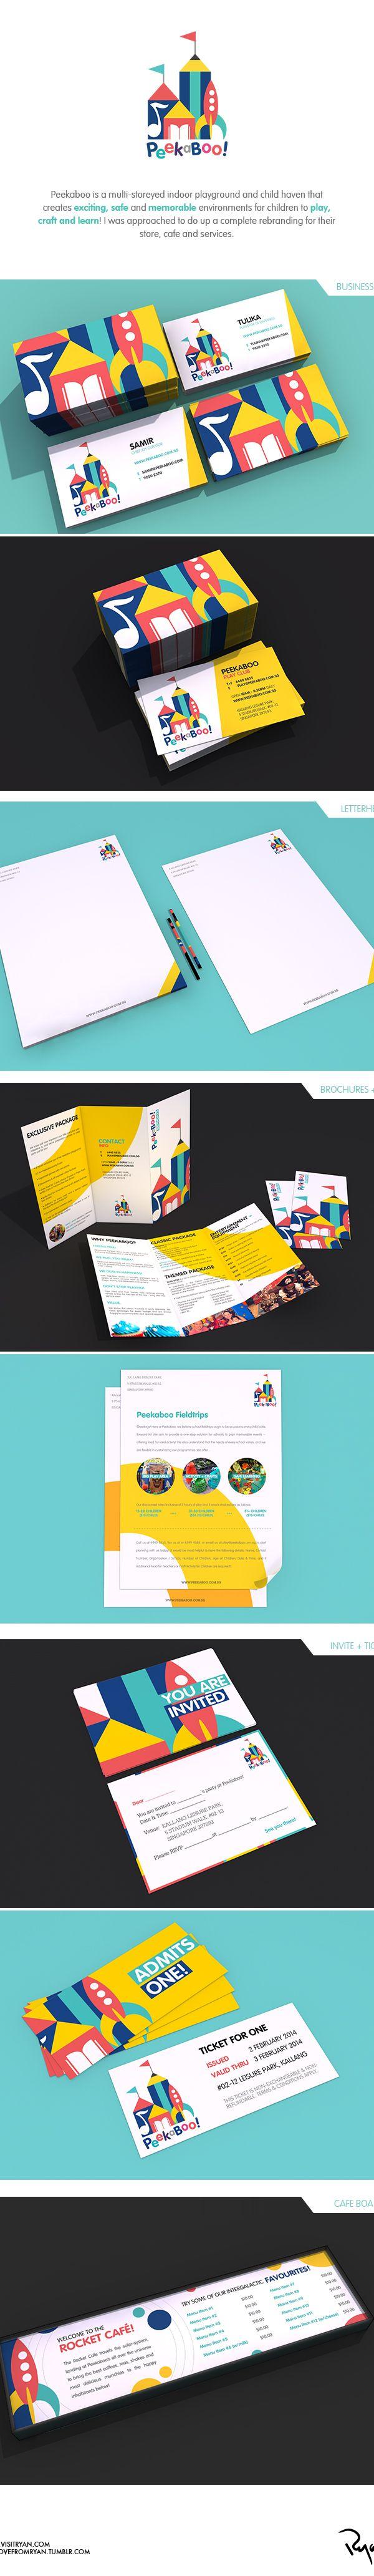 Peekaboo Playhouse | Identity Design on Behance